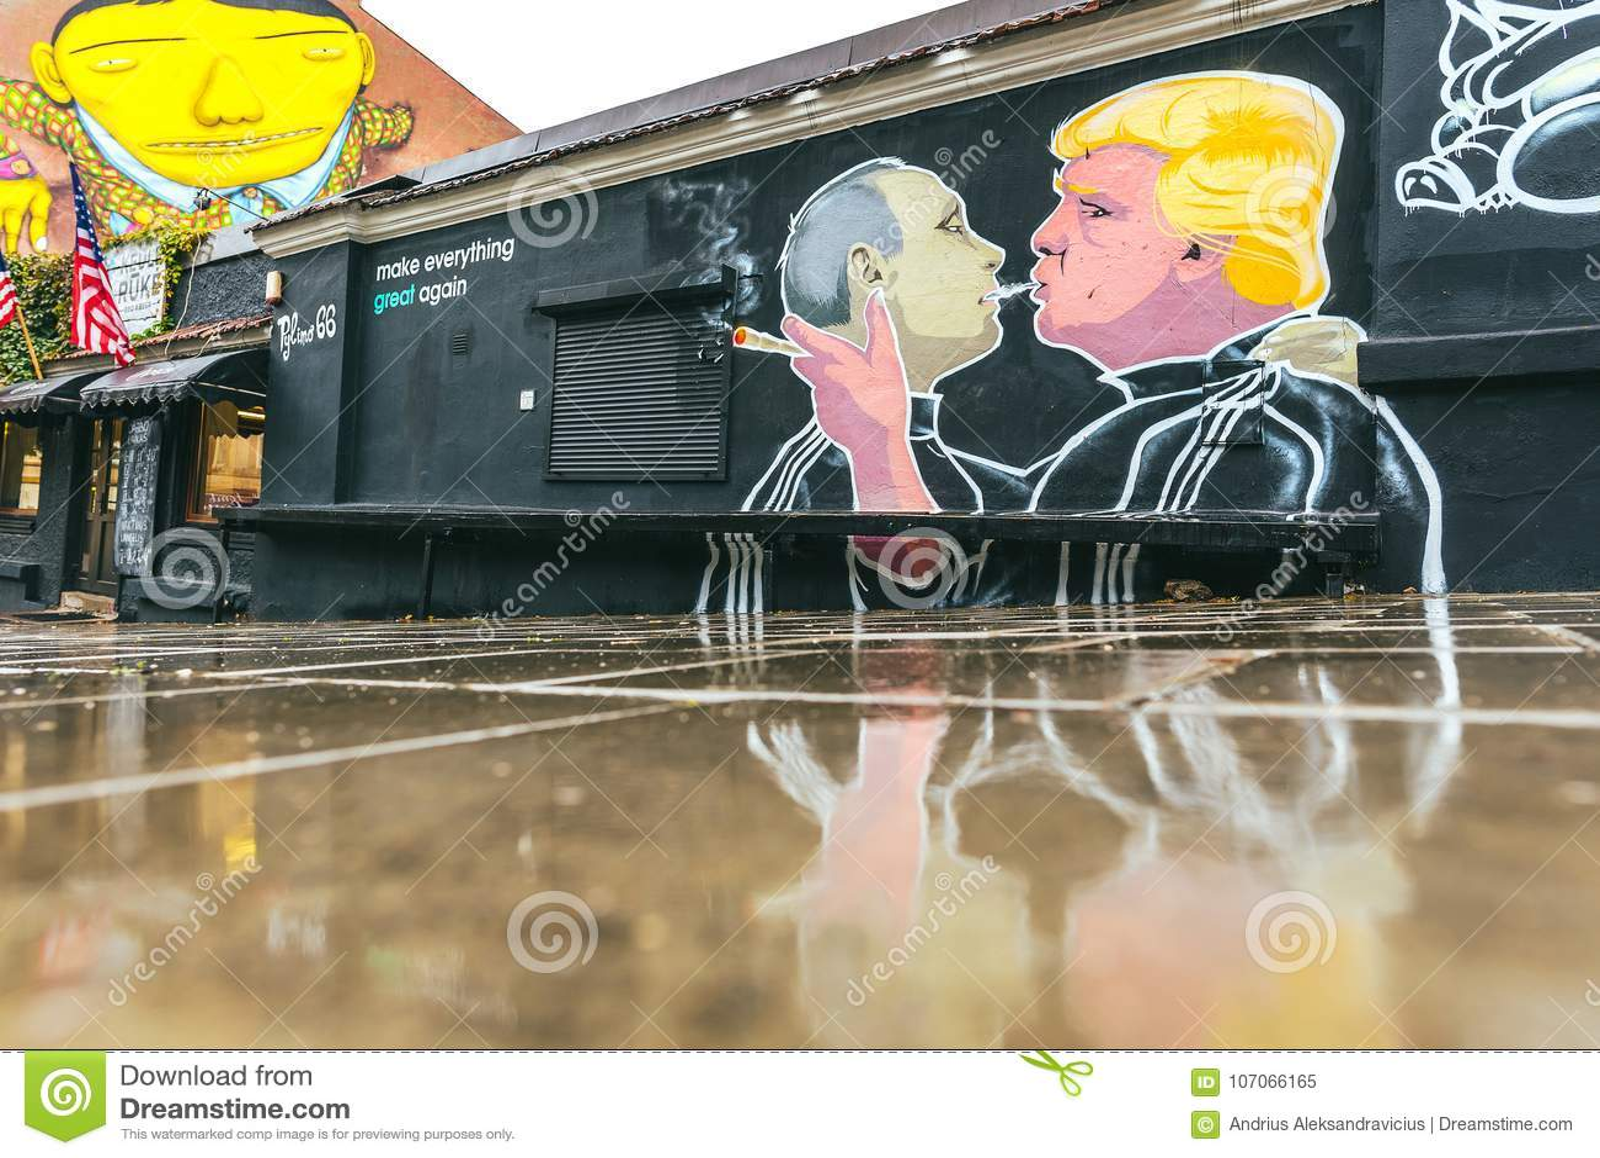 Peinture murale de baiser de Donald Trump Vladimir Putin